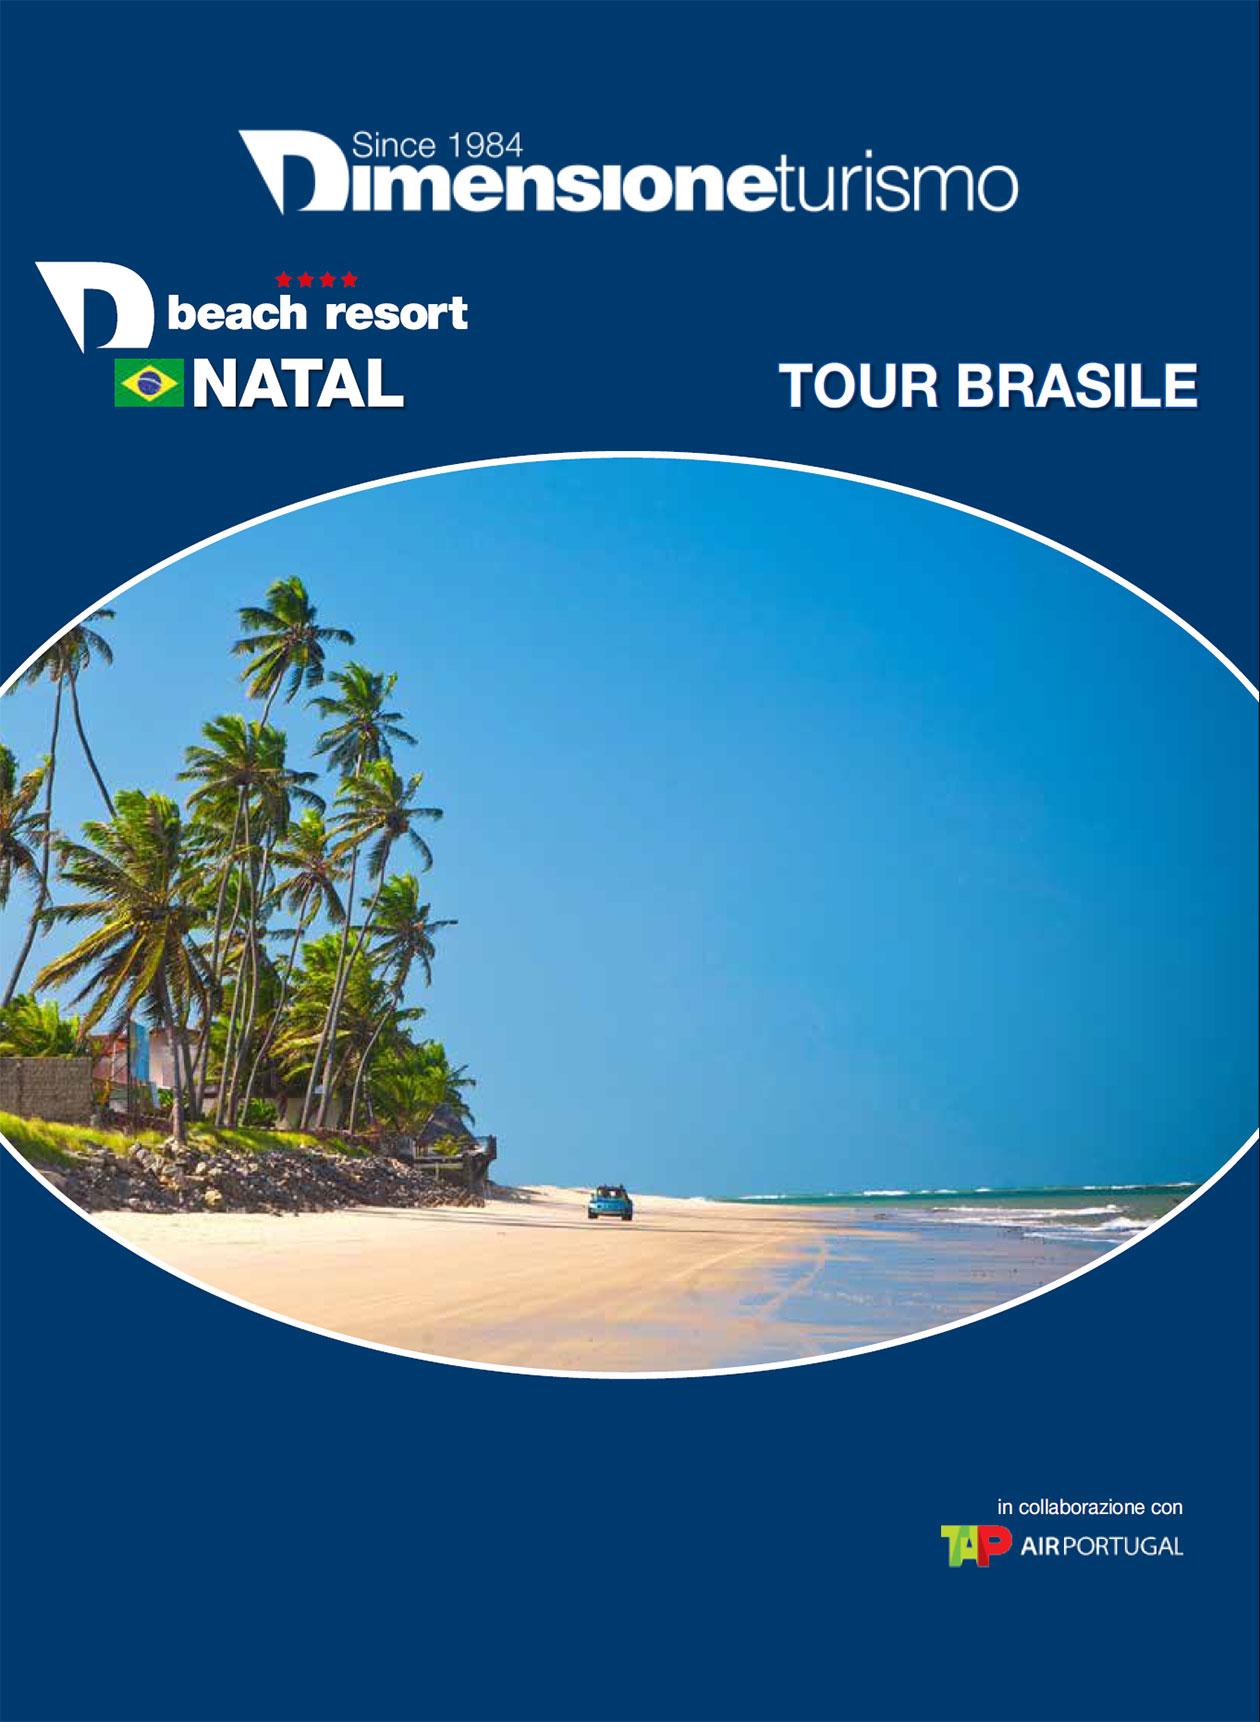 Copertina brochure Brasile